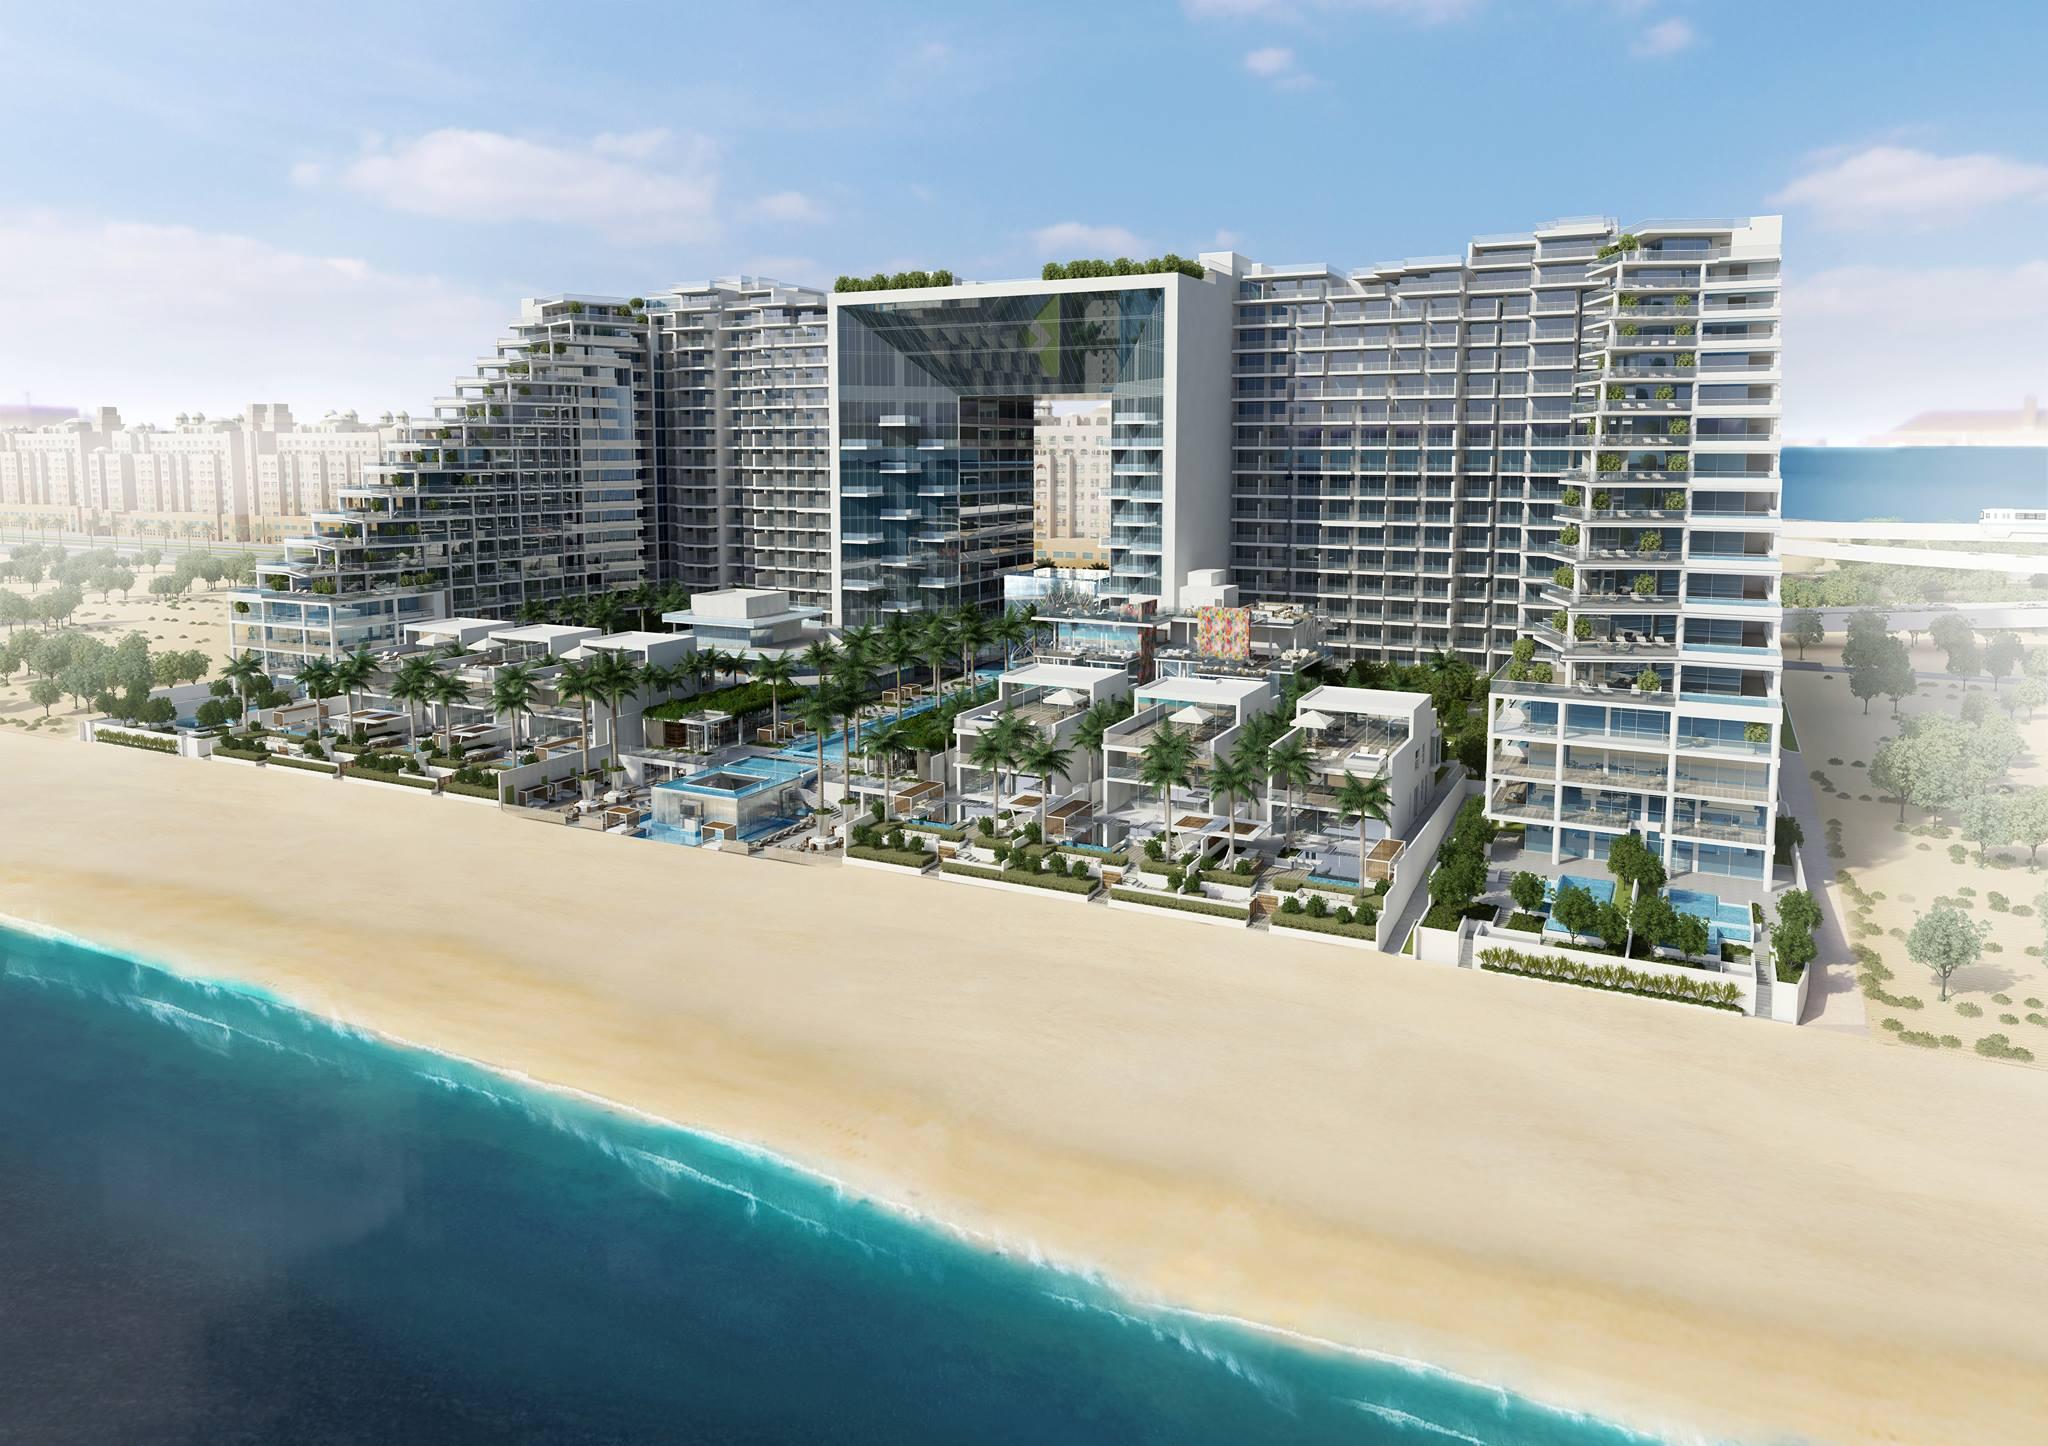 Viceroy Hotels & Residences